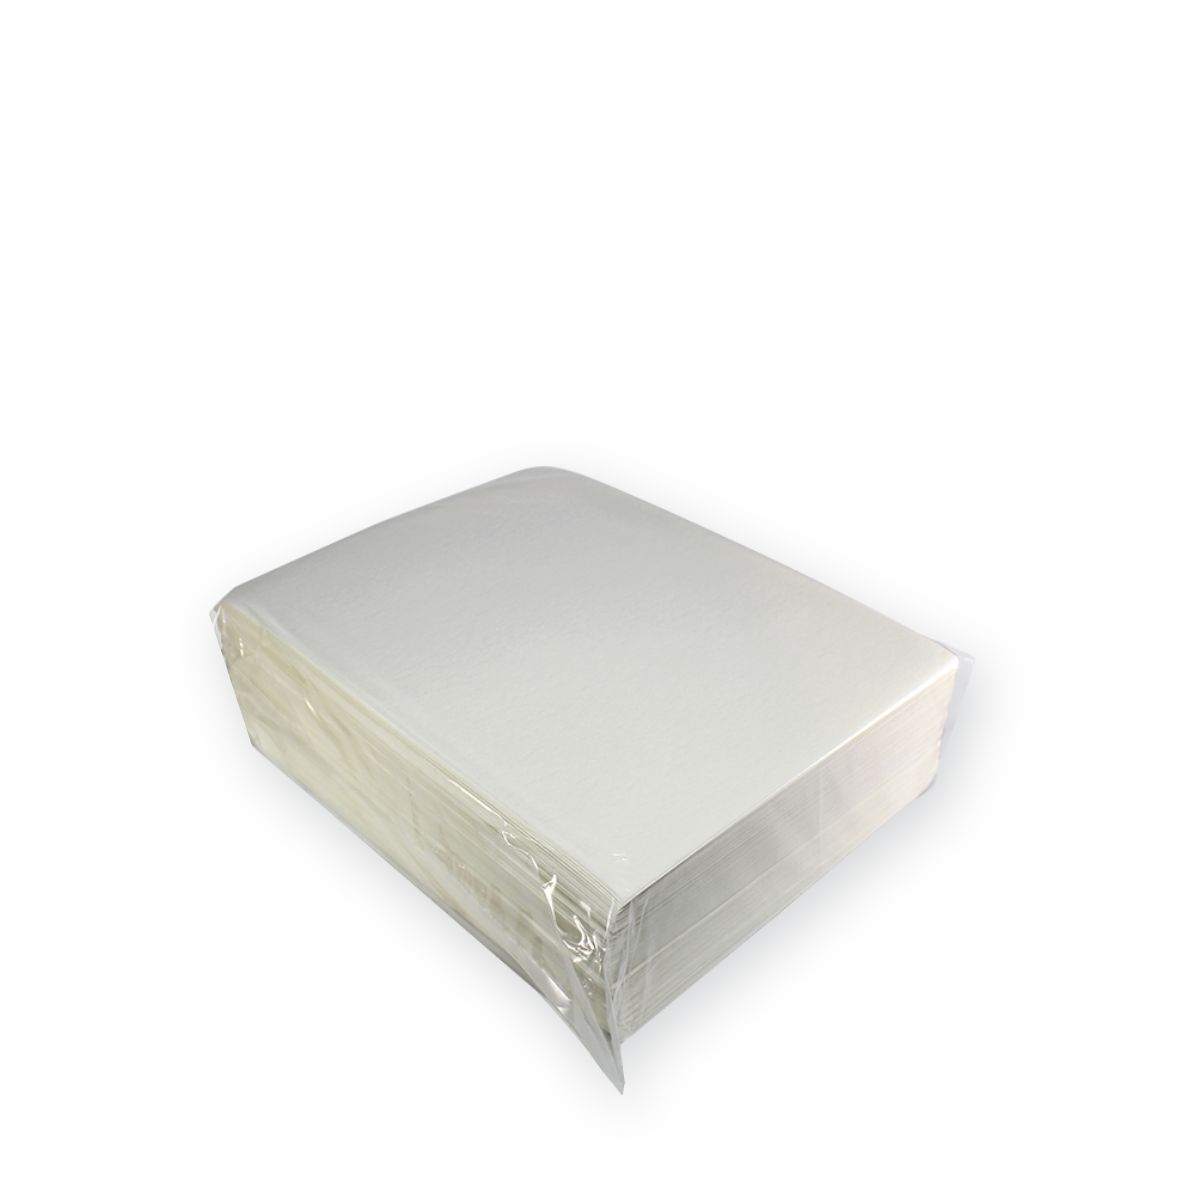 Papel Filtro Tipo Mata Borrão Gramatura 250 g 20 x 20 cm (100 unidades)